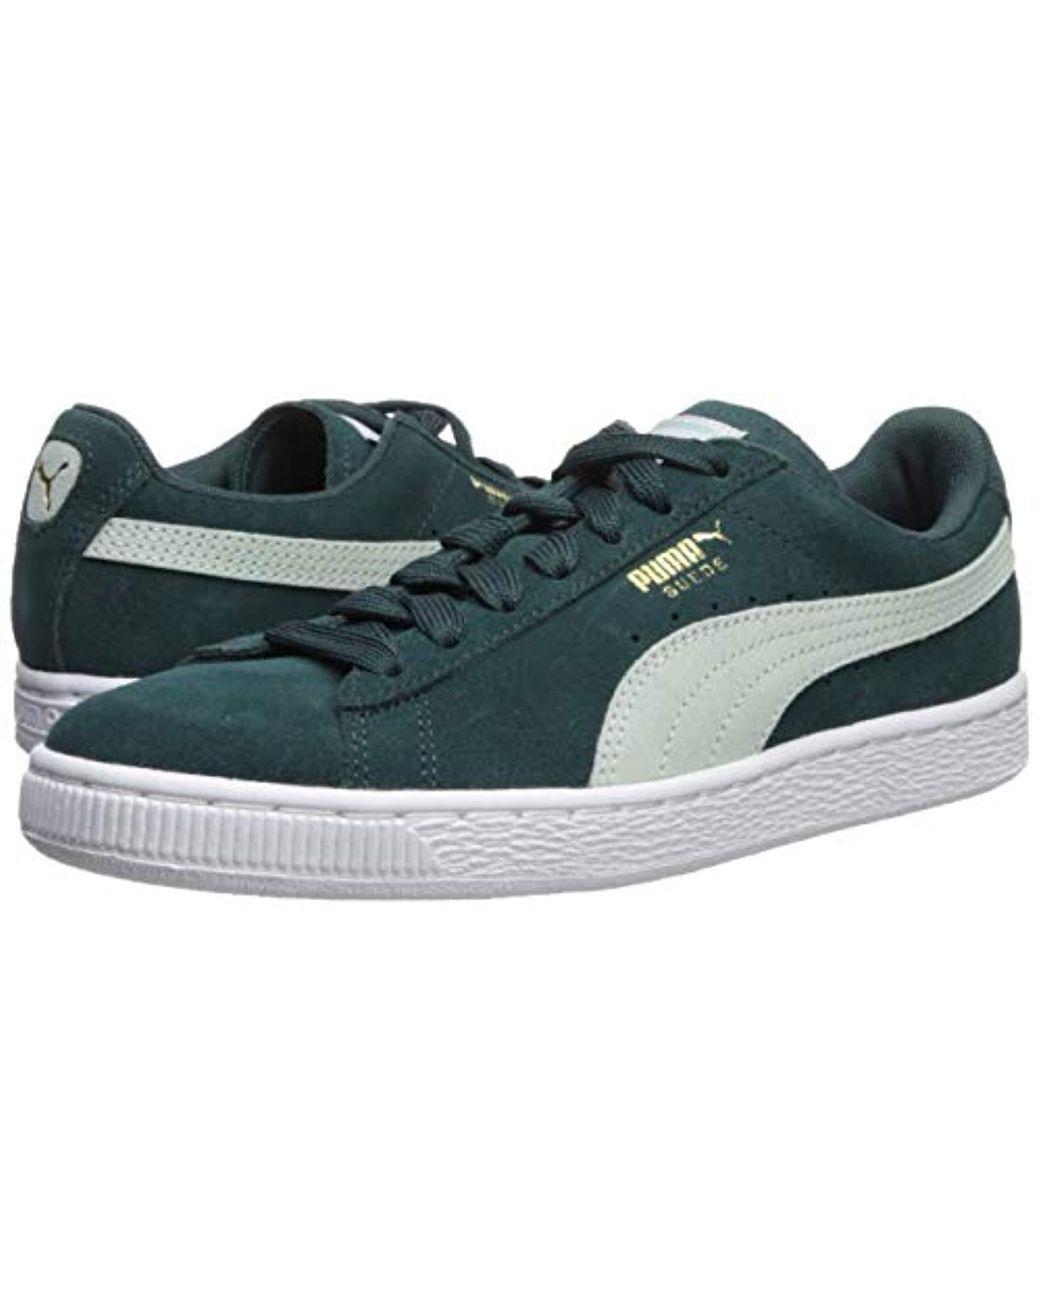 bc2cfeafedfe9c PUMA Suede Classic Sneaker for Men - Lyst